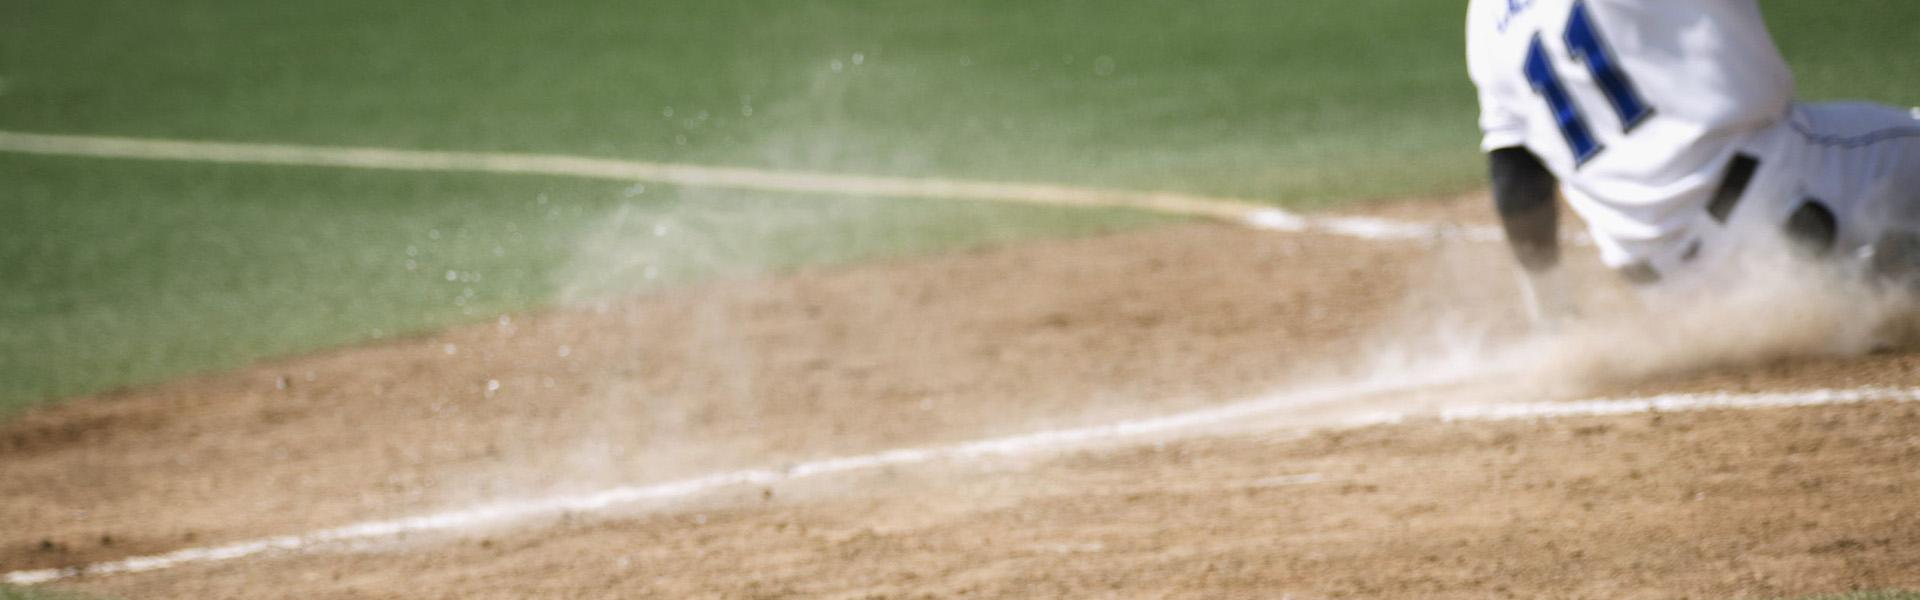 Arizona Premier Men's Adult Baseball League